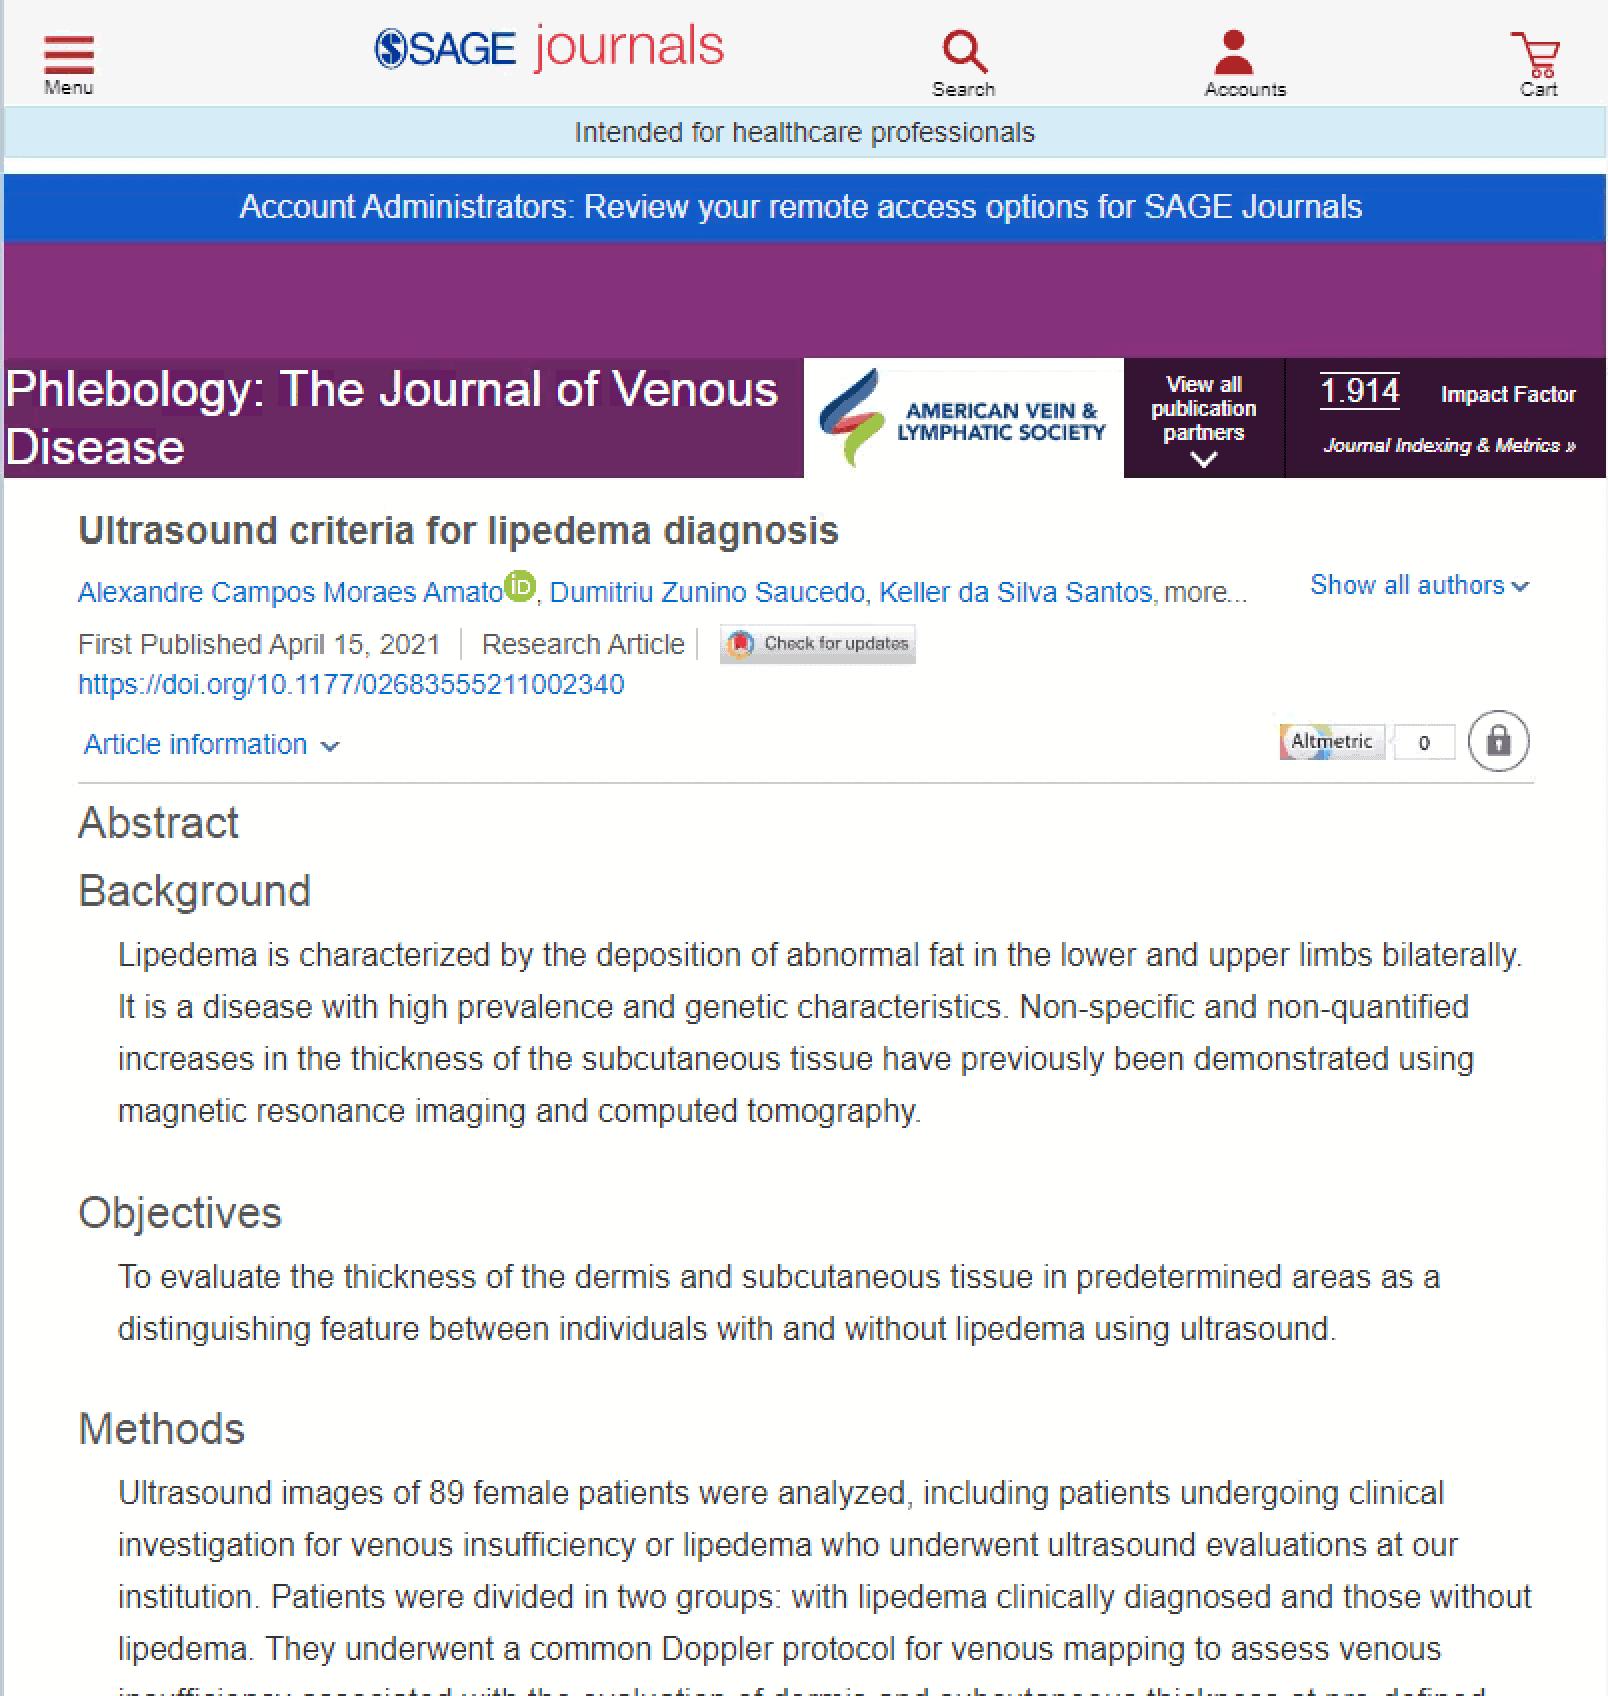 Equipe do Instituto Amato/Vascular.pro publica o primeiro protocolo ultrassonográfico do mundo para diagnóstico do lipedema<span class=